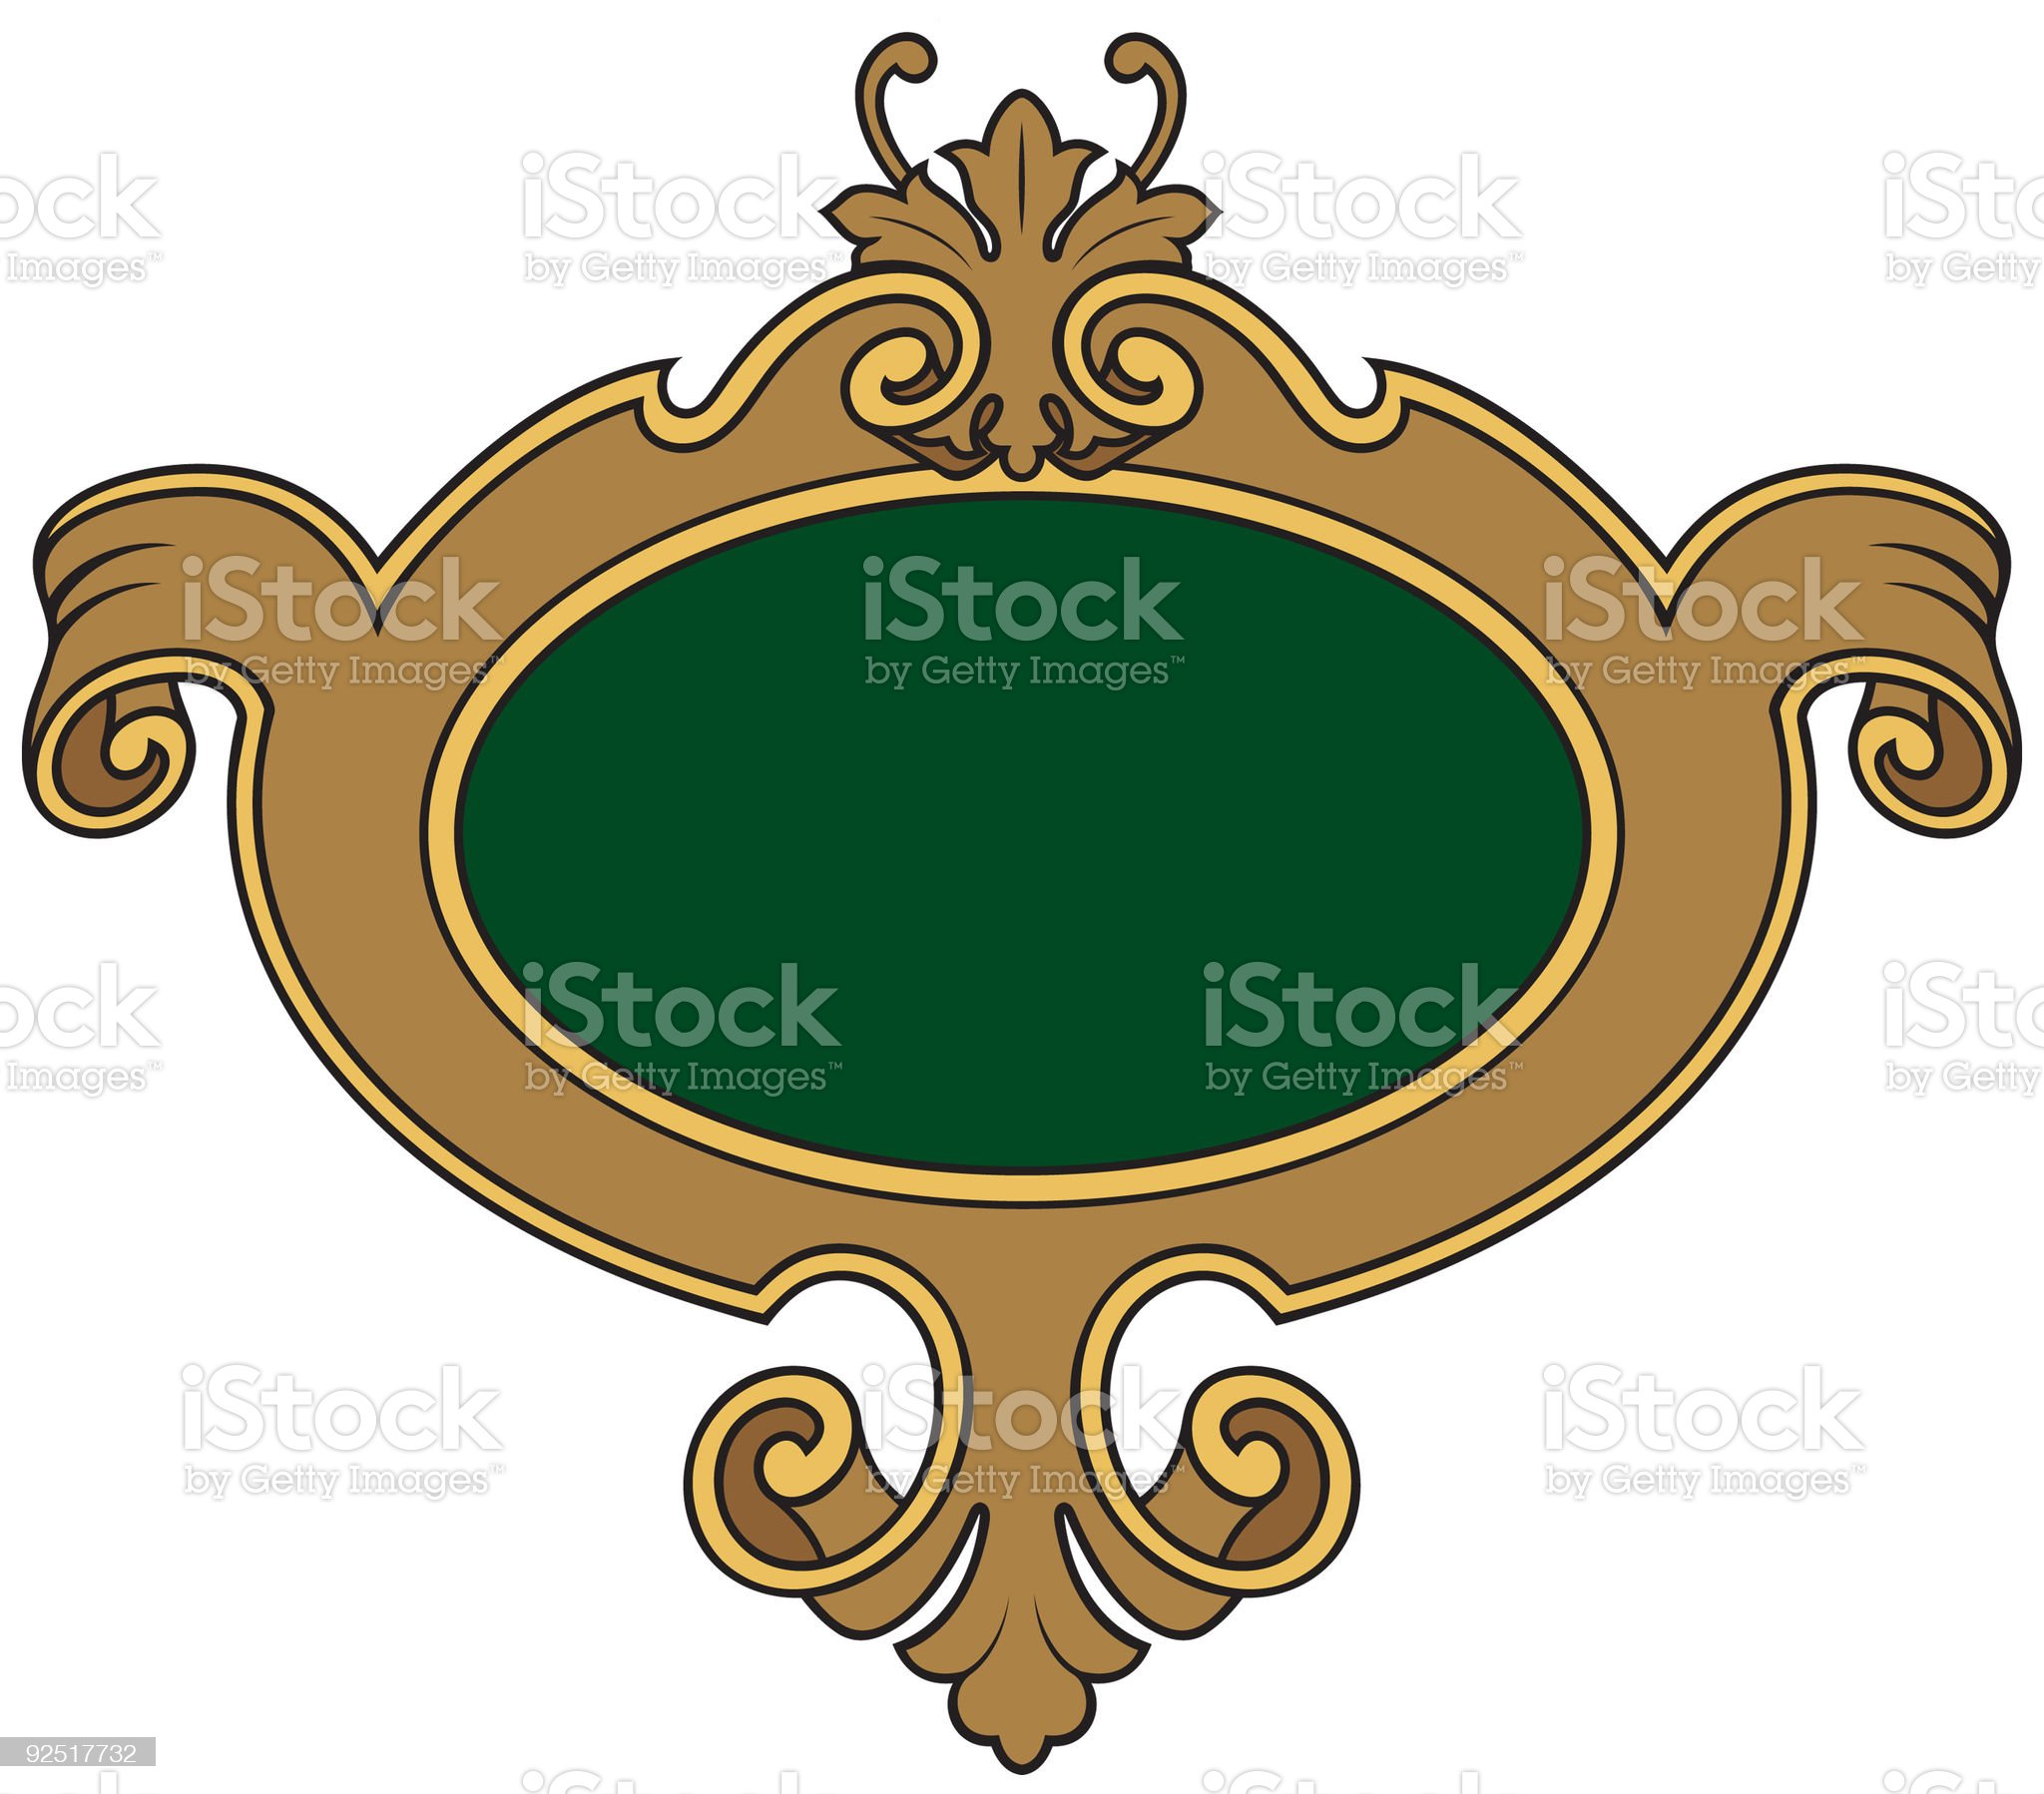 Shield 1571 royalty-free stock vector art